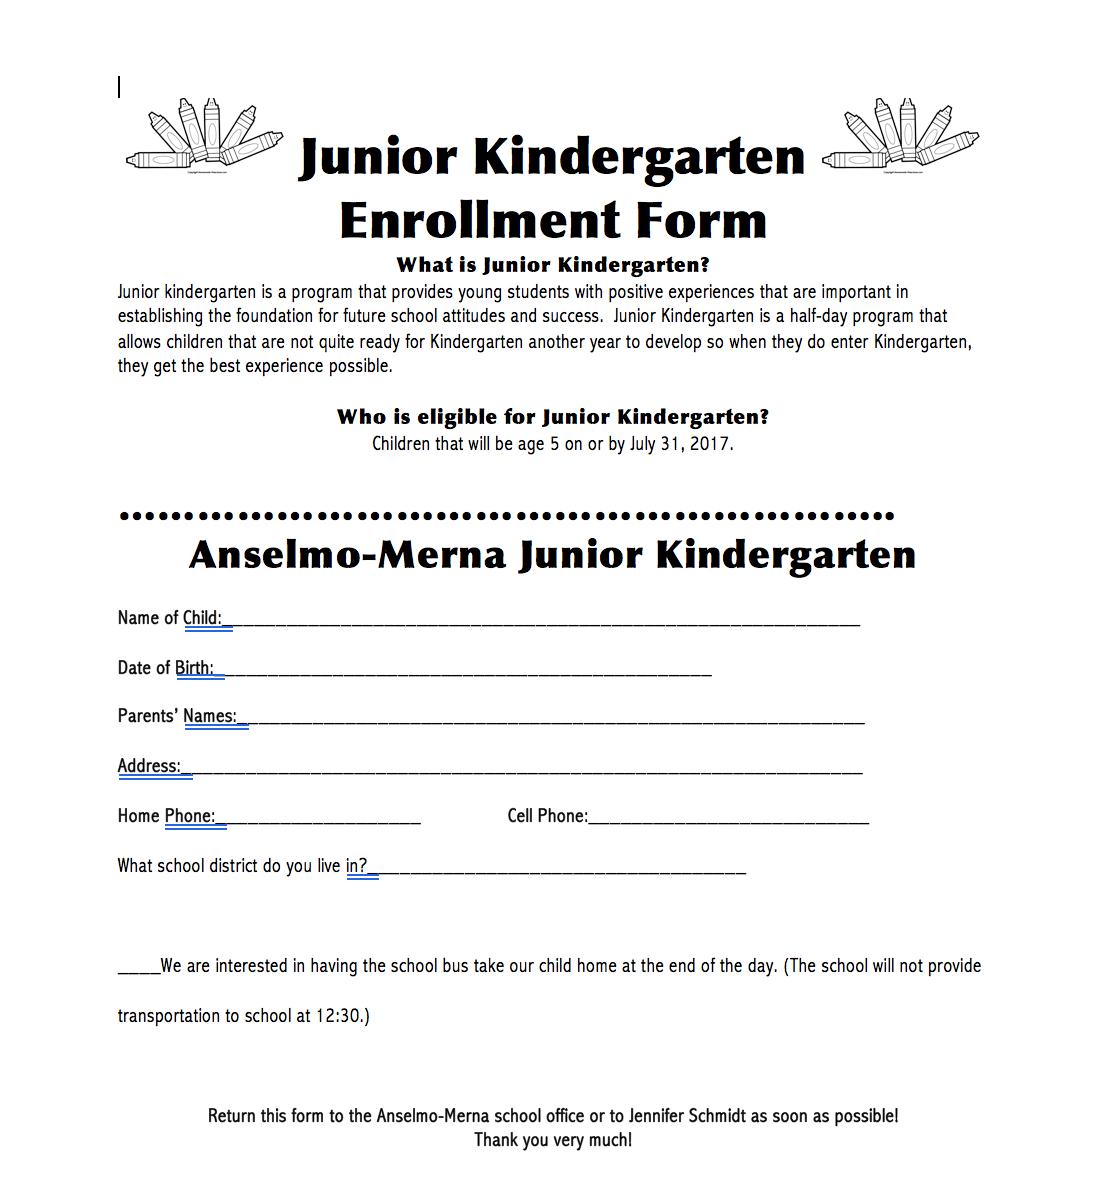 Anselmo-Merna Public School - Pre-School/Junior Kindergarten 2017-18 ...